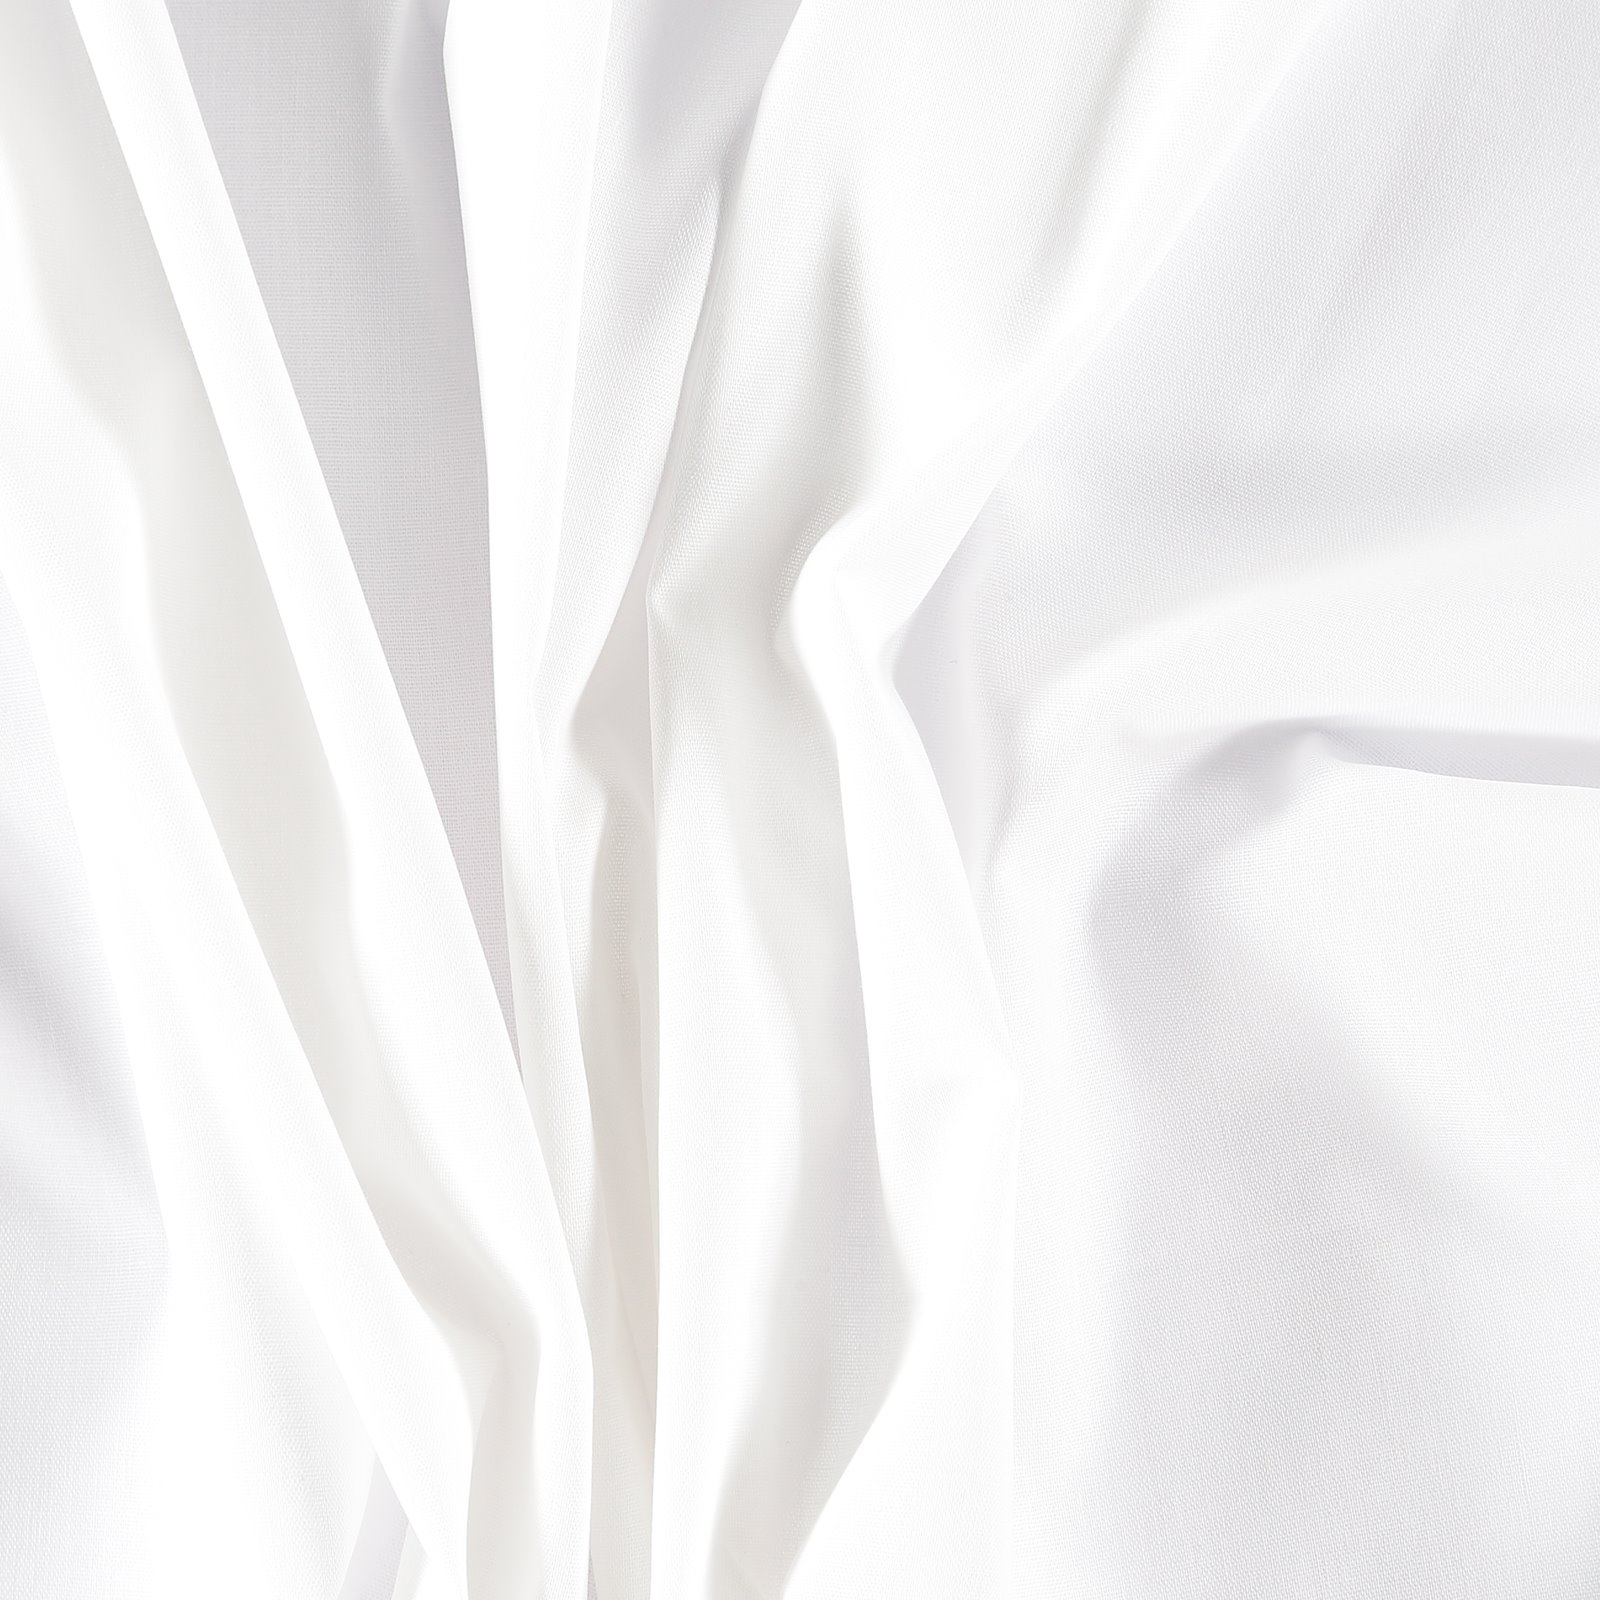 Light woven cotton white